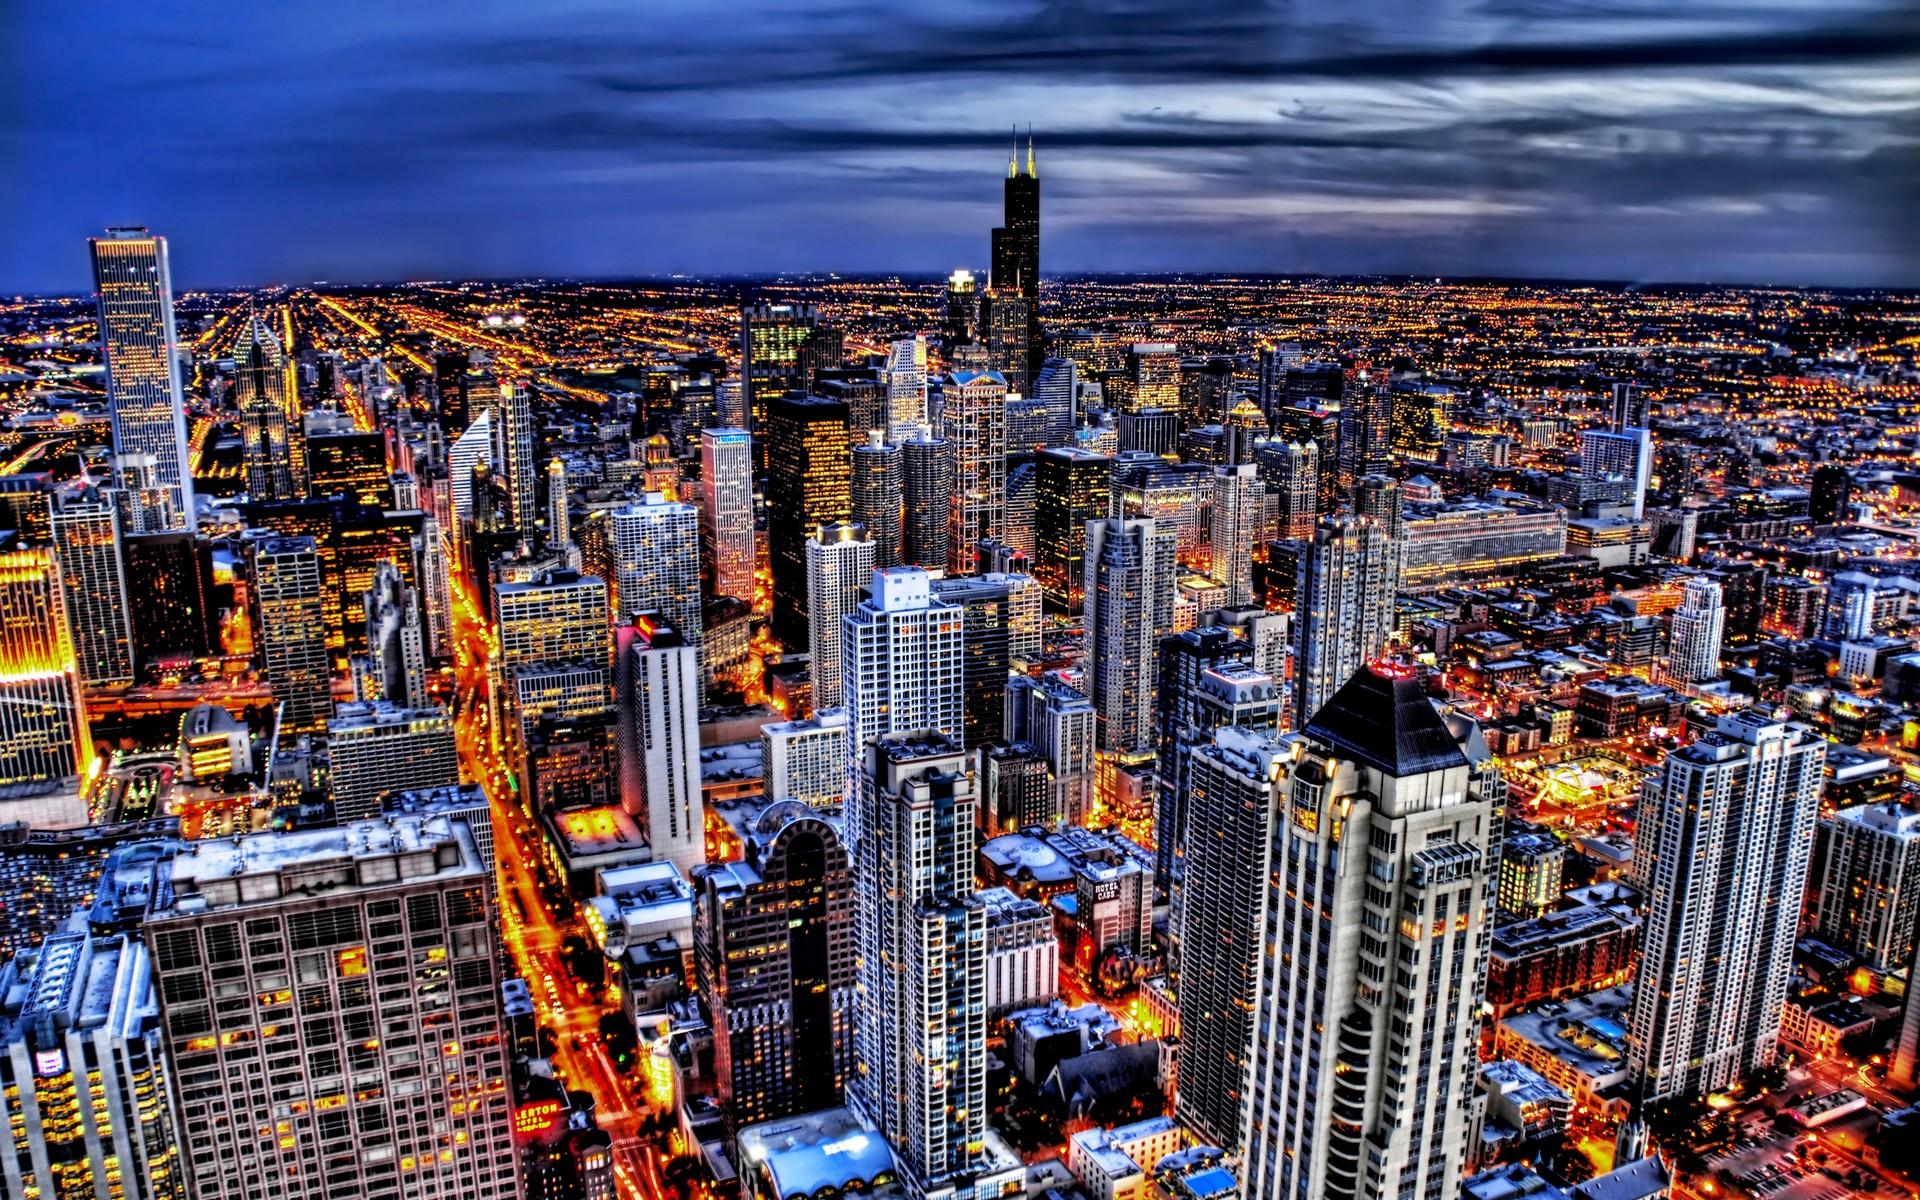 City HD Wallpaper Images For Desktop Download 1920x1200